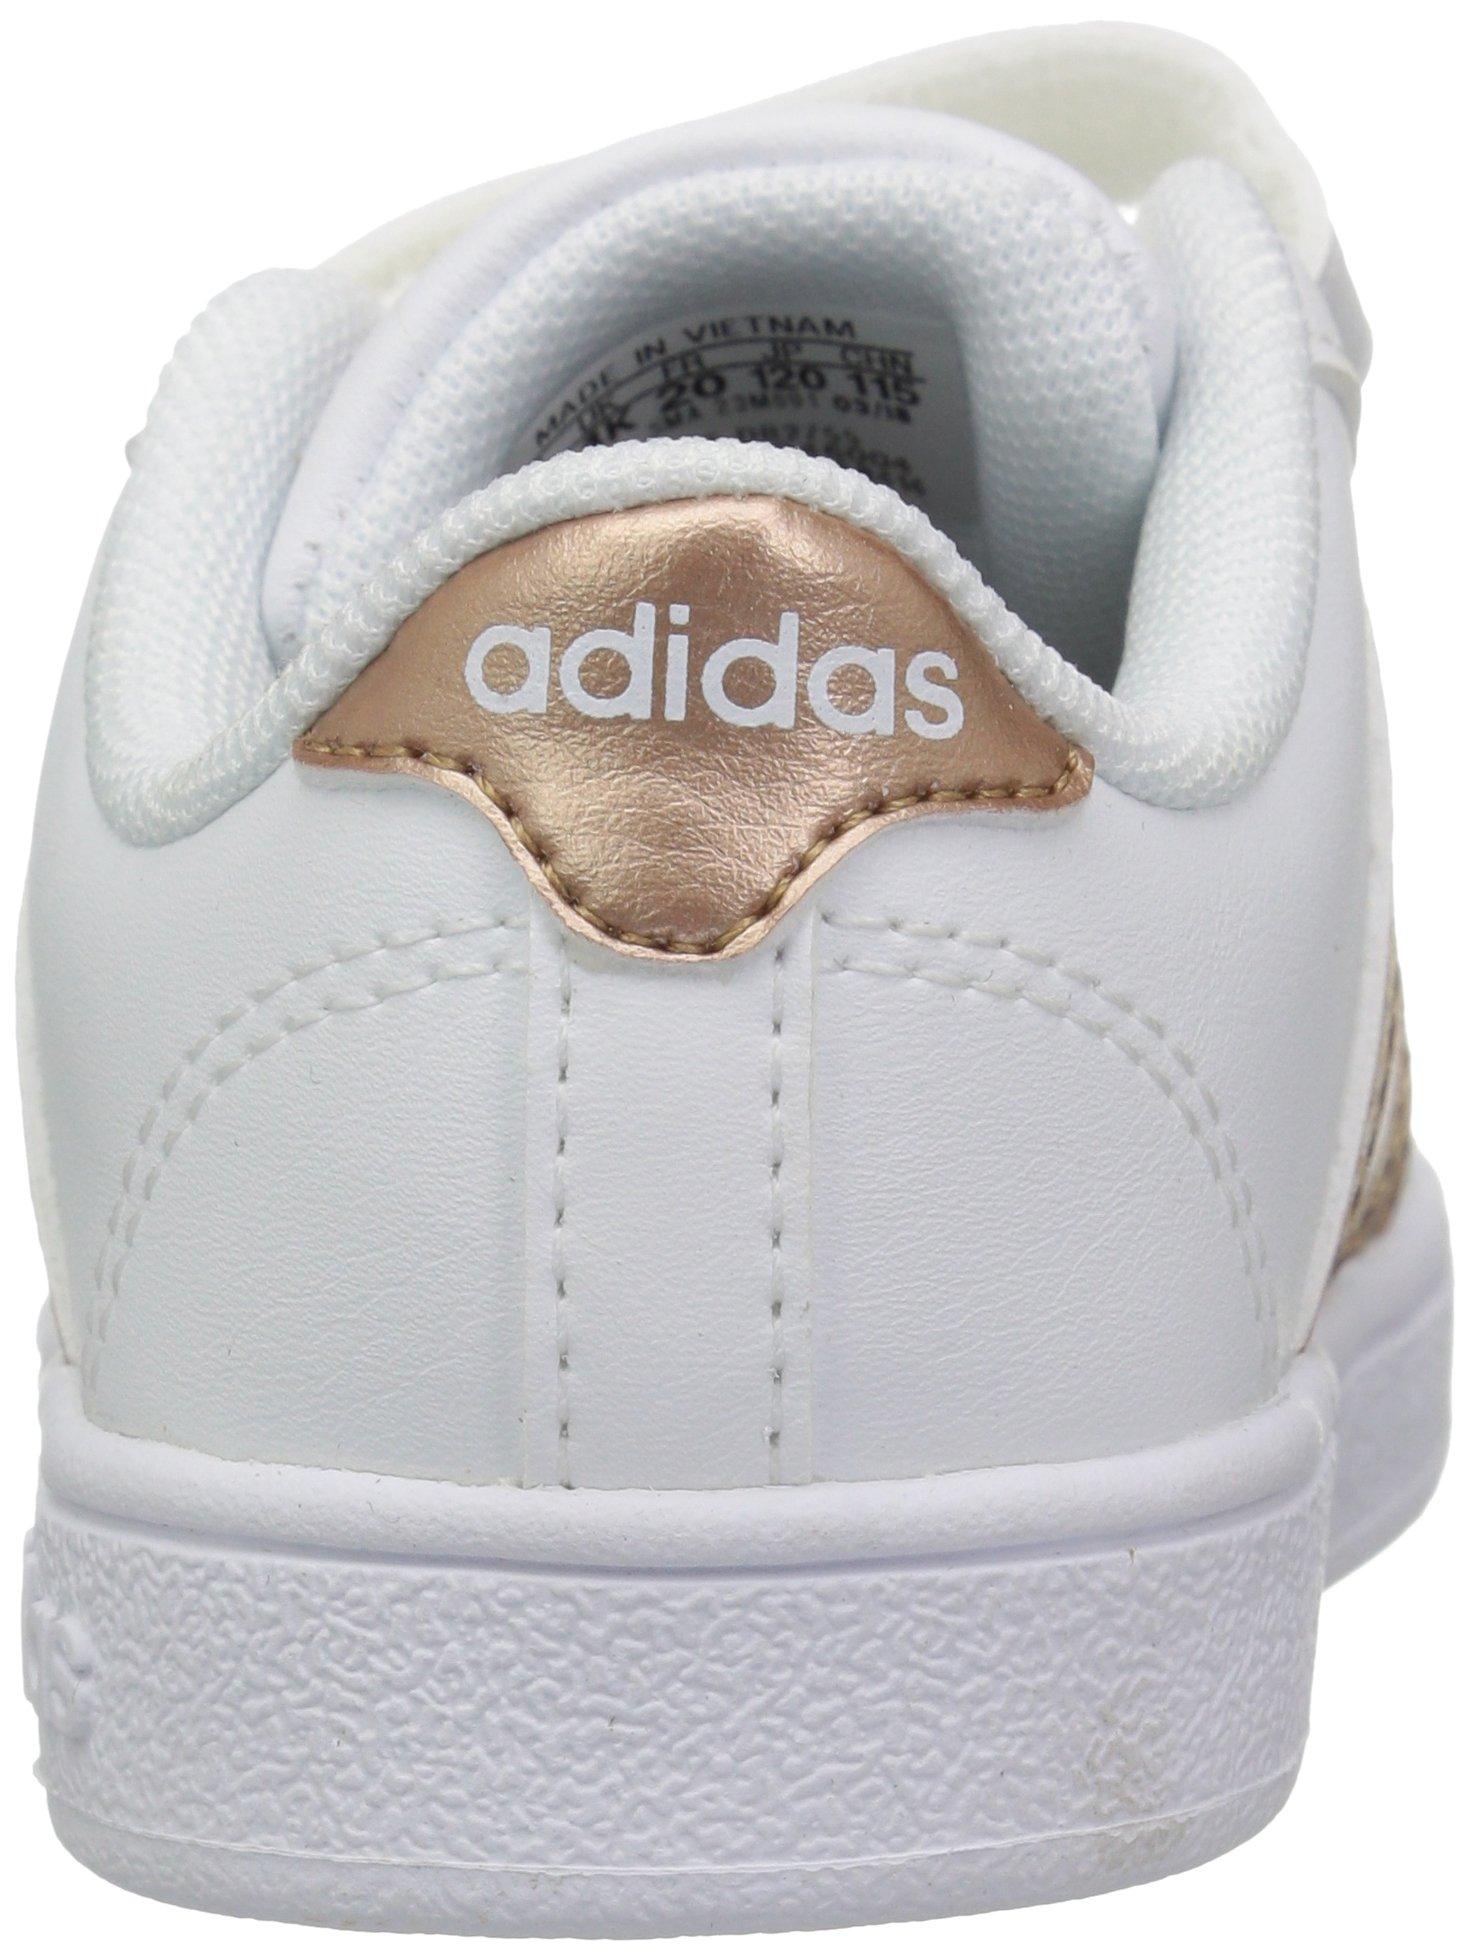 adidas Performance Baby Baseline, White/Copper Metallic/Black, 6K M US Toddler by adidas (Image #2)